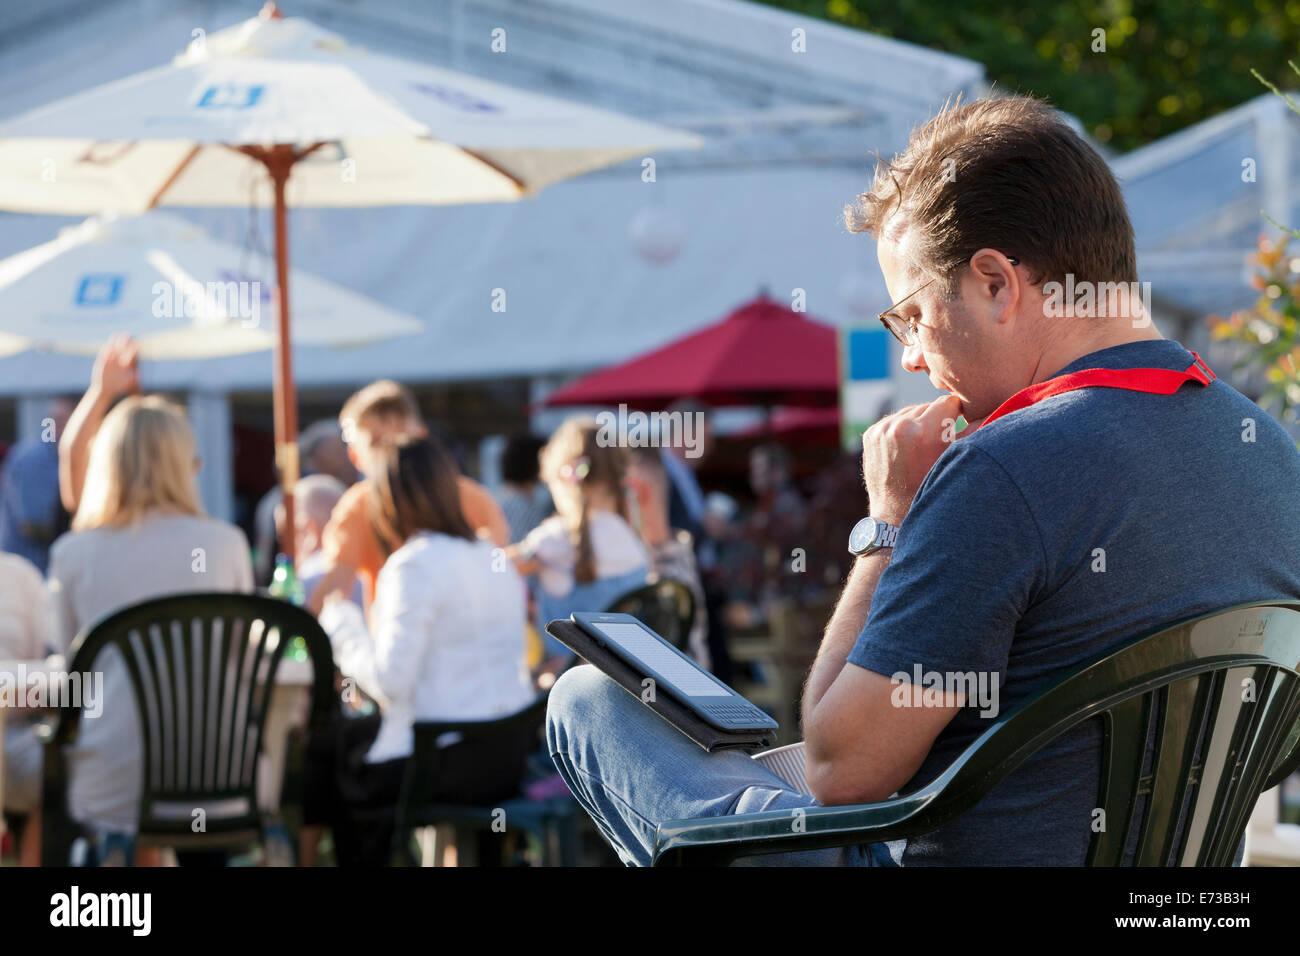 A visitor reads an e-book on the opening day of the Edinburgh International Book Festival 2014. Edinburgh, Scotland. - Stock Image